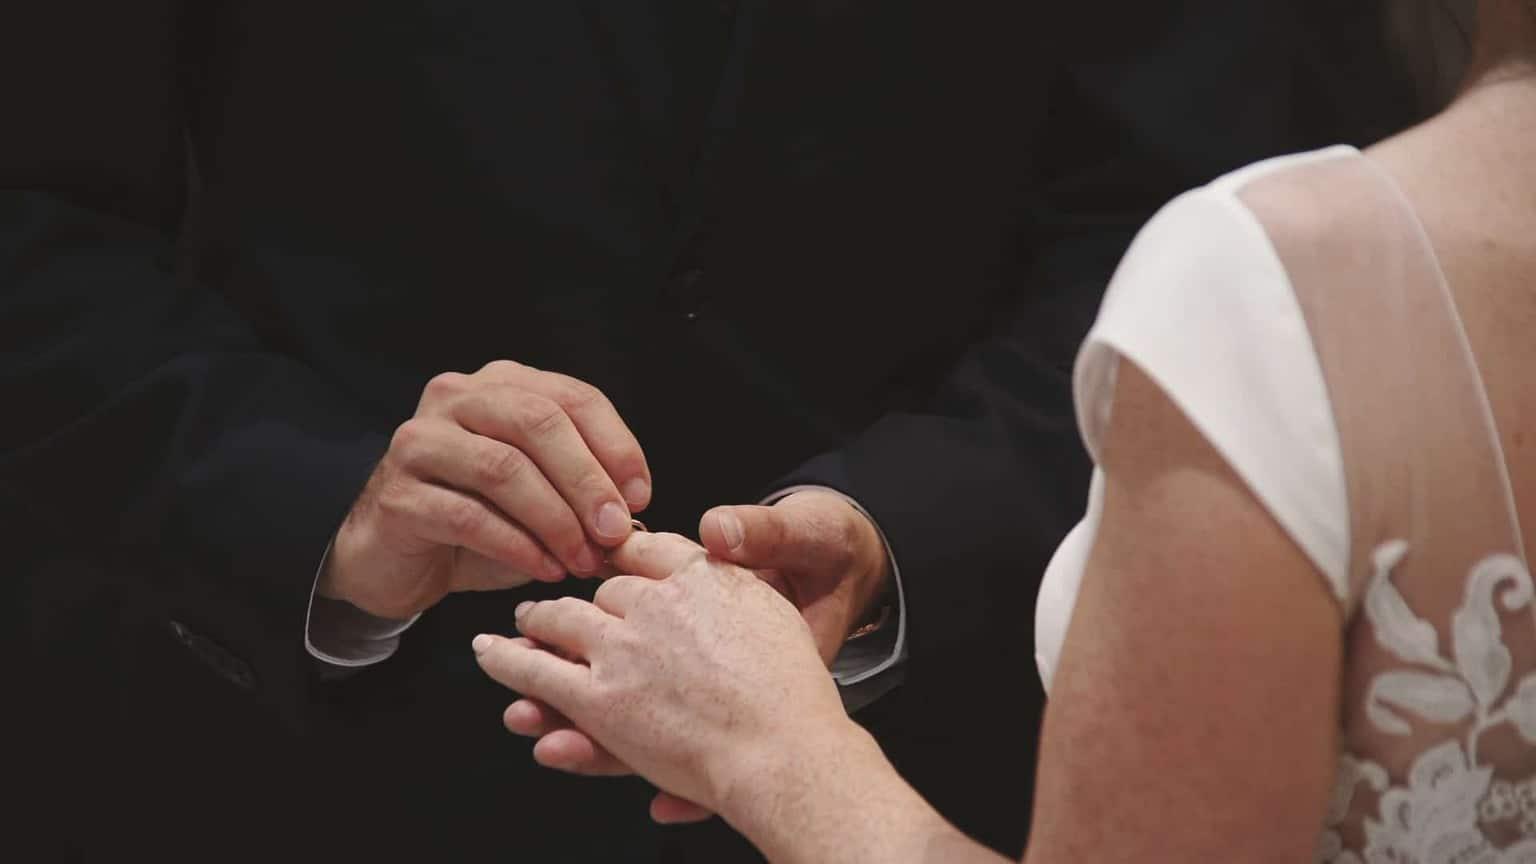 Close look at exchanging wedding ring.